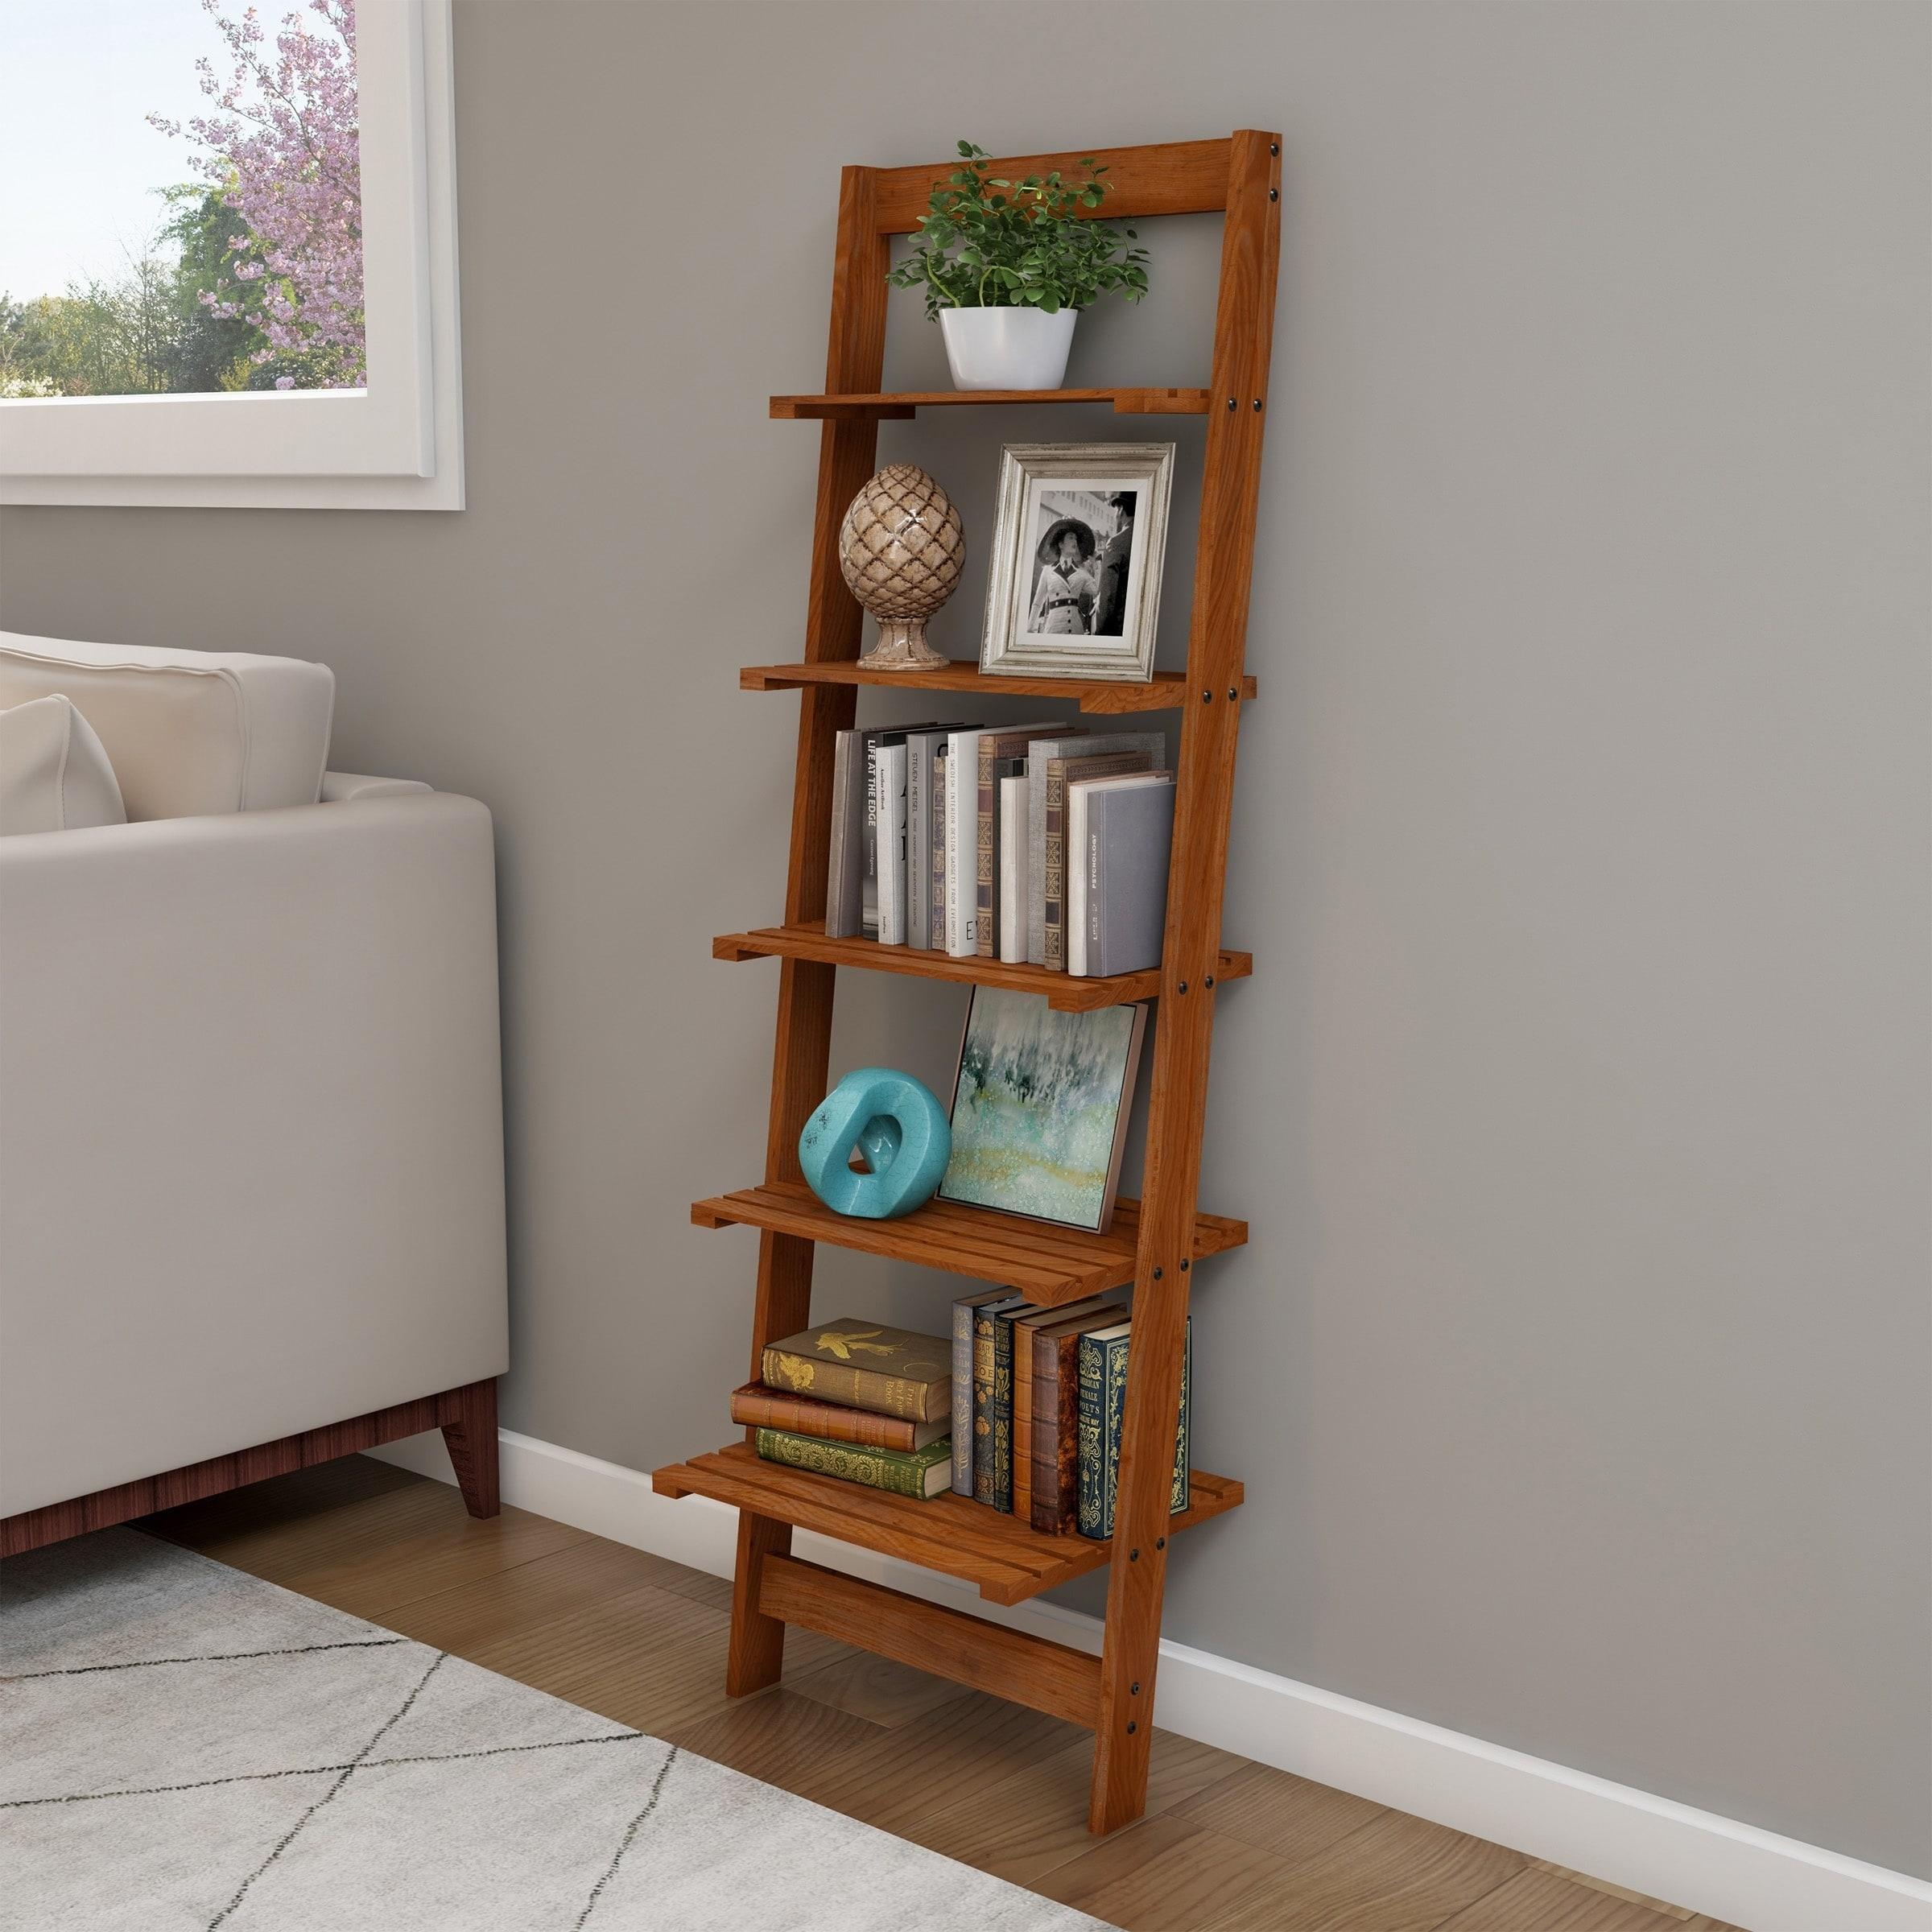 5 Tier Ladder Bookshelf By Lavish Home On Sale Overstock 29806786